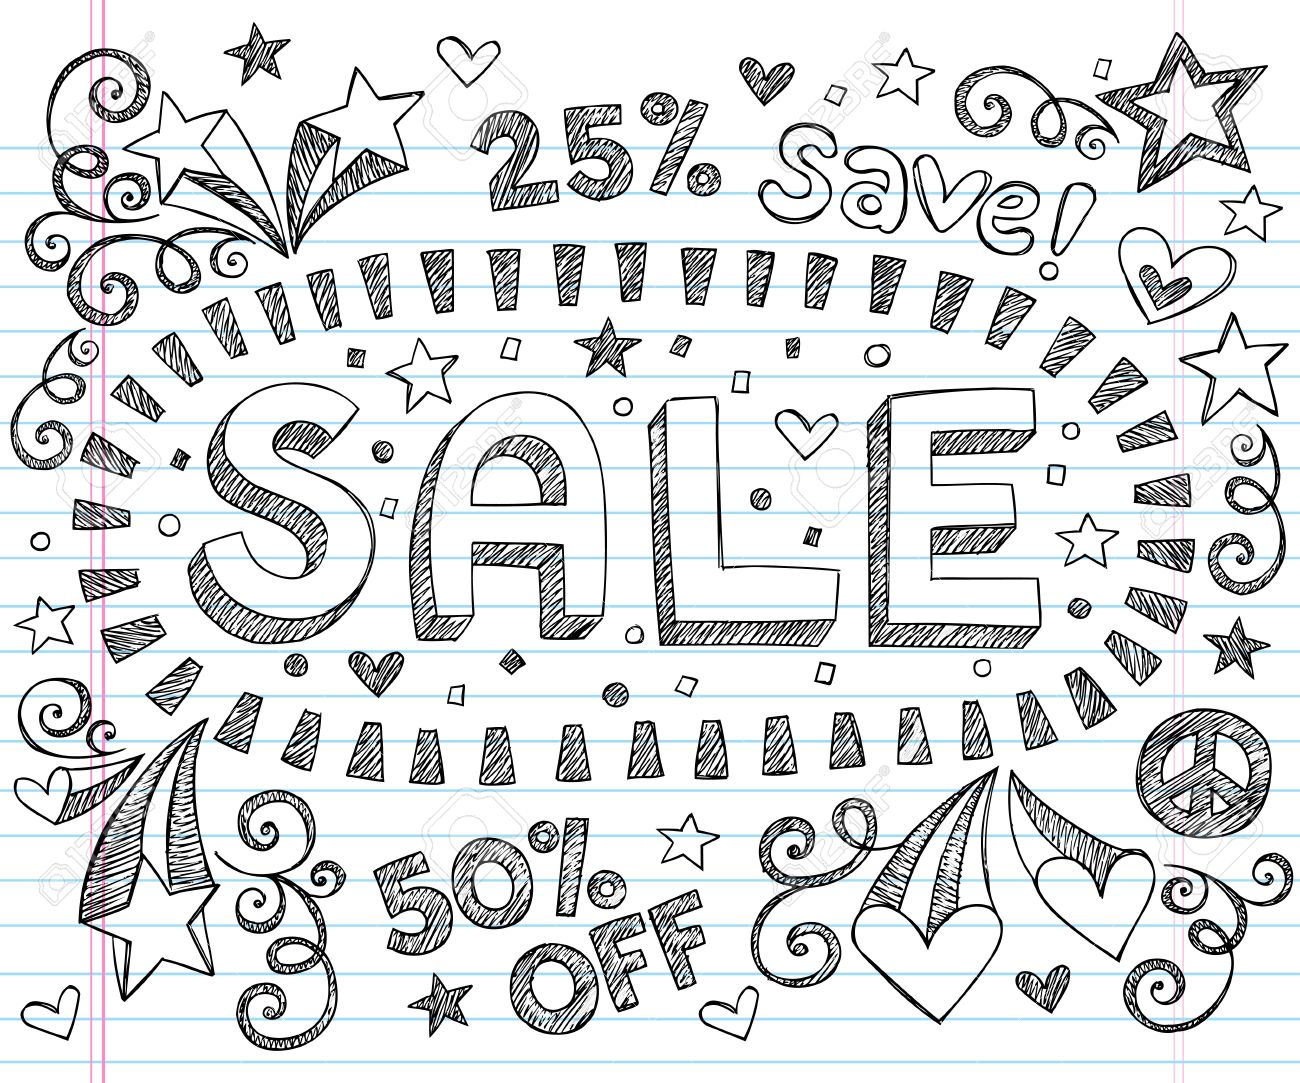 Sale Sketchy Notebook Doodles Discount 50  Off Shopping Hand-Drawn Illustration Design Elements on Lined Sketchbook Paper Background Stock Vector - 14733862